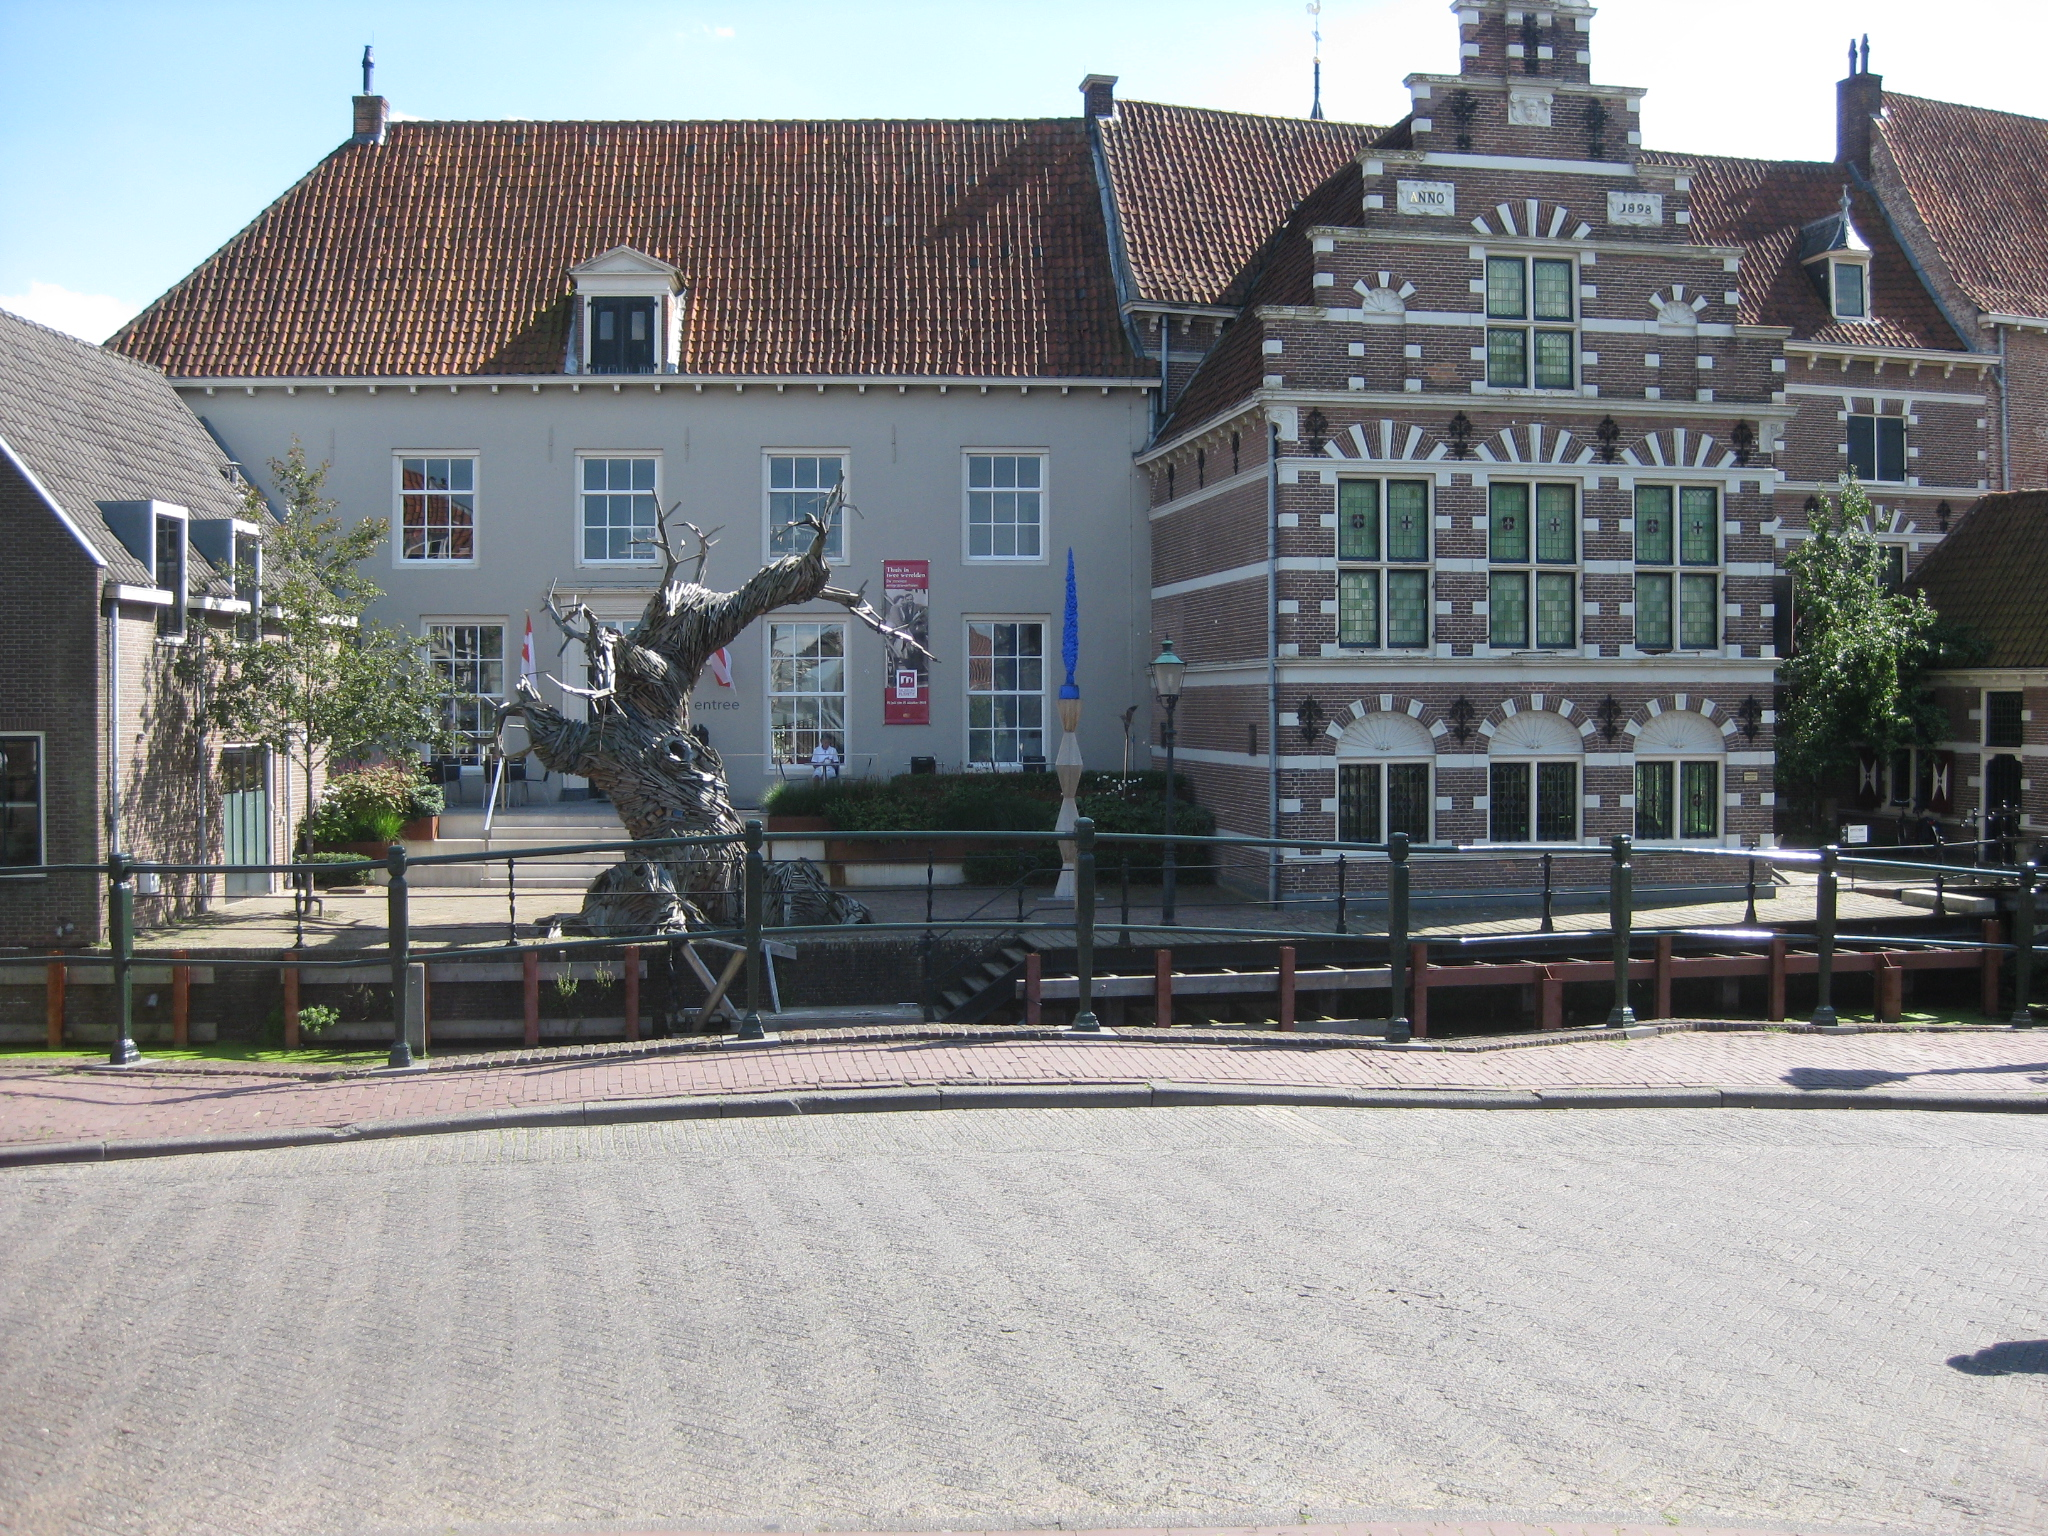 Amersfoort et le musée Flehite